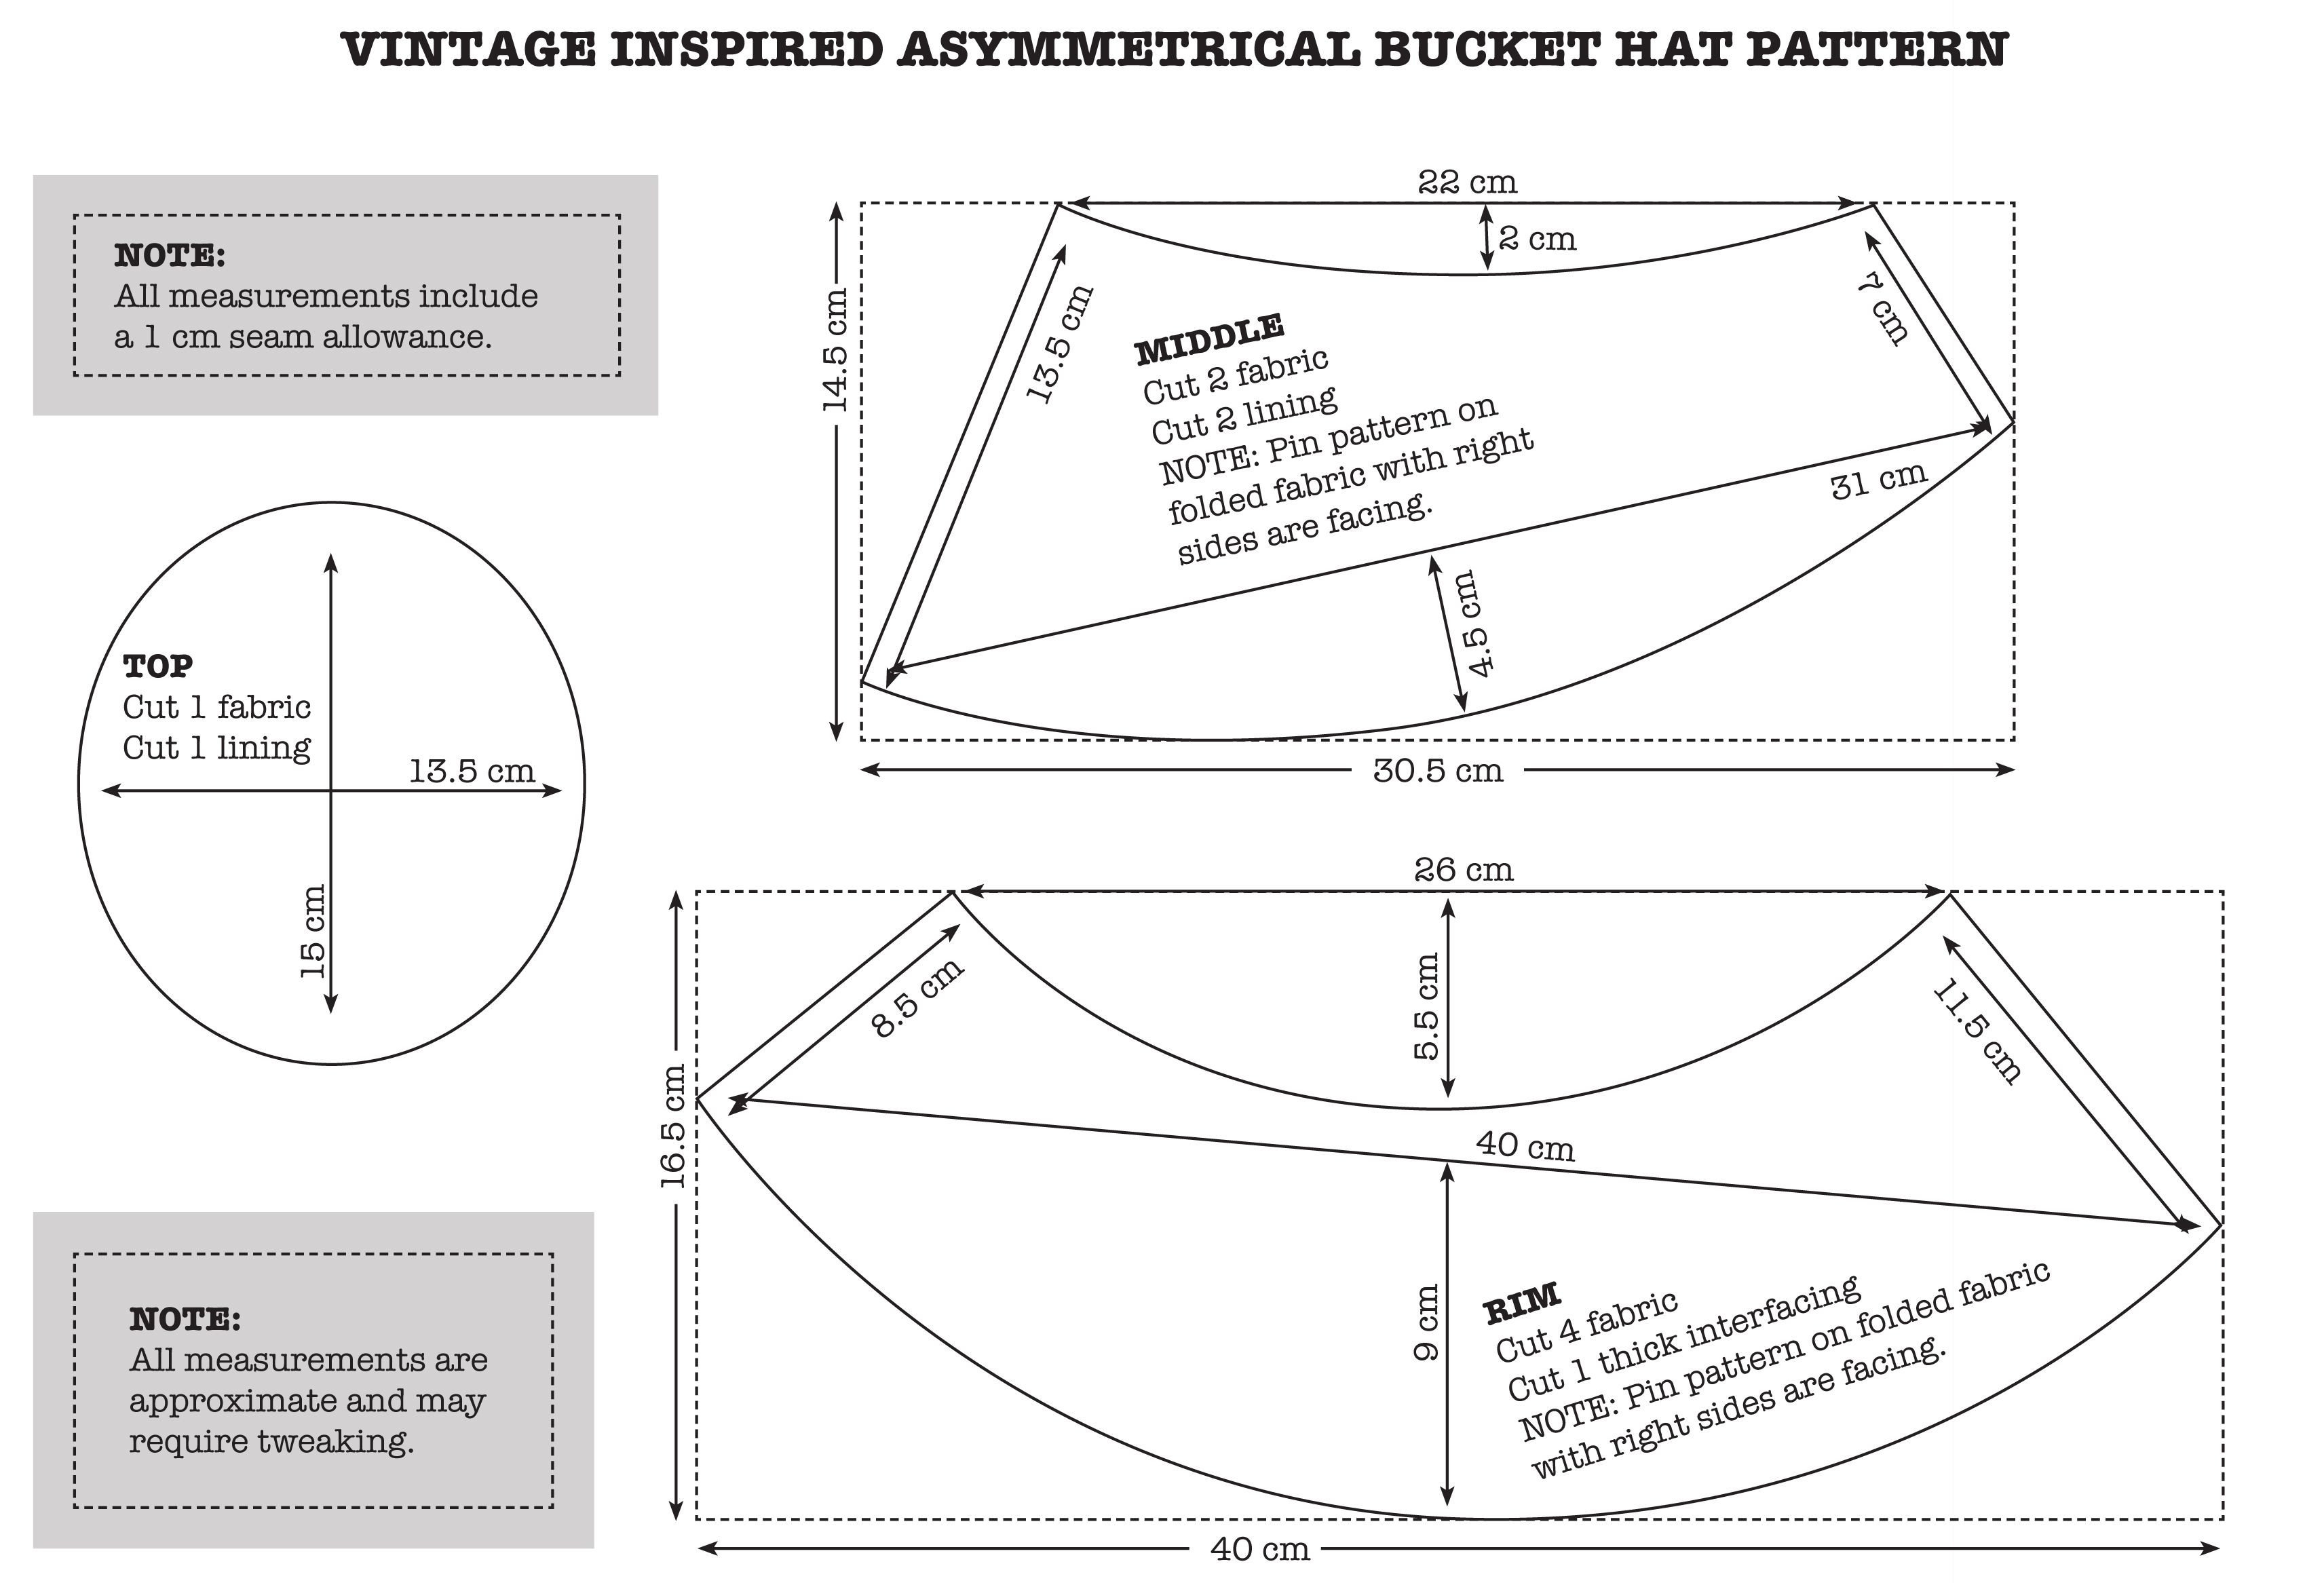 Pin By Tatjana Djurovic On Hat Making Hat Patterns To